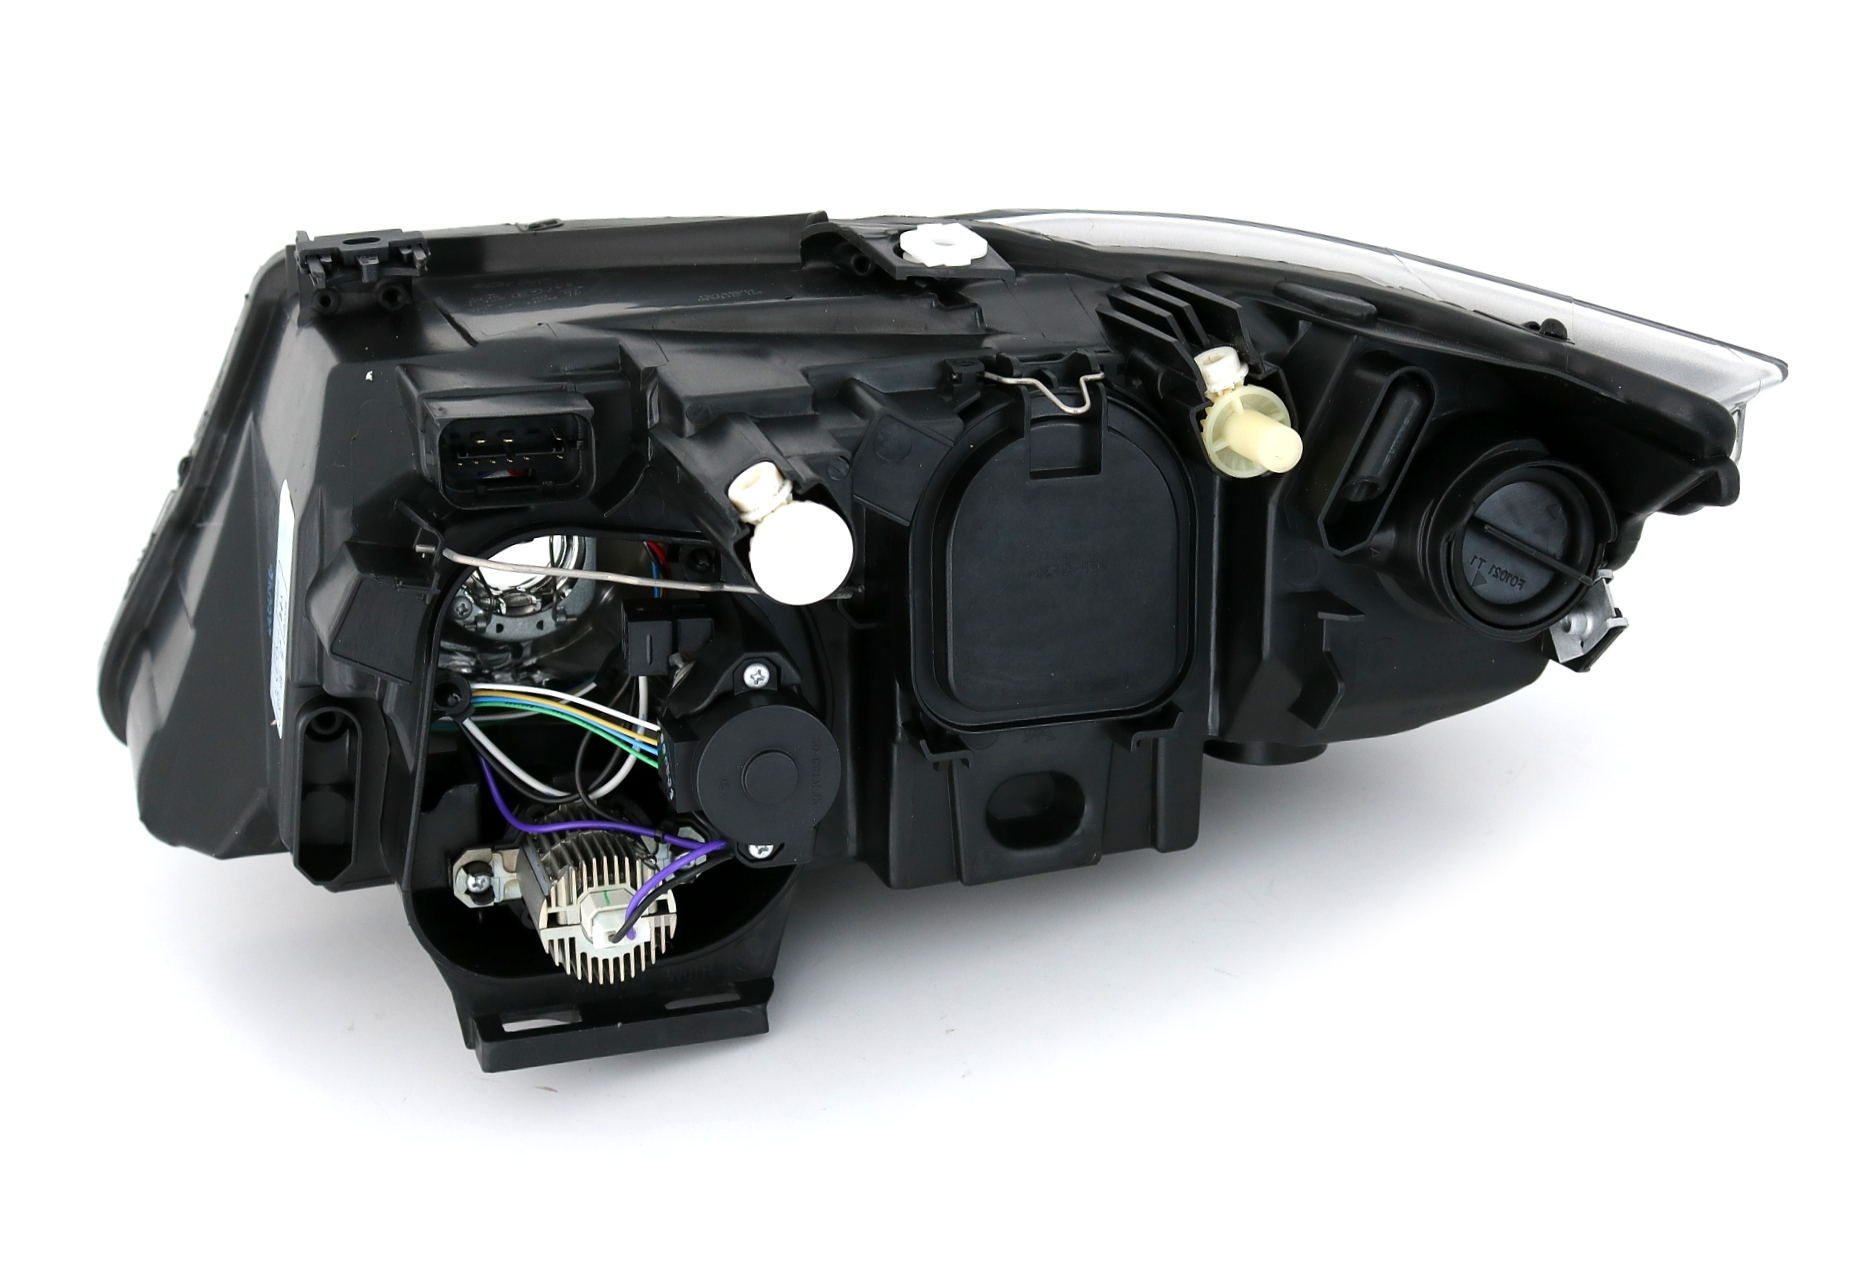 scheinwerfer rechts 3er bmw e90 limo e91 touring 08 11. Black Bedroom Furniture Sets. Home Design Ideas